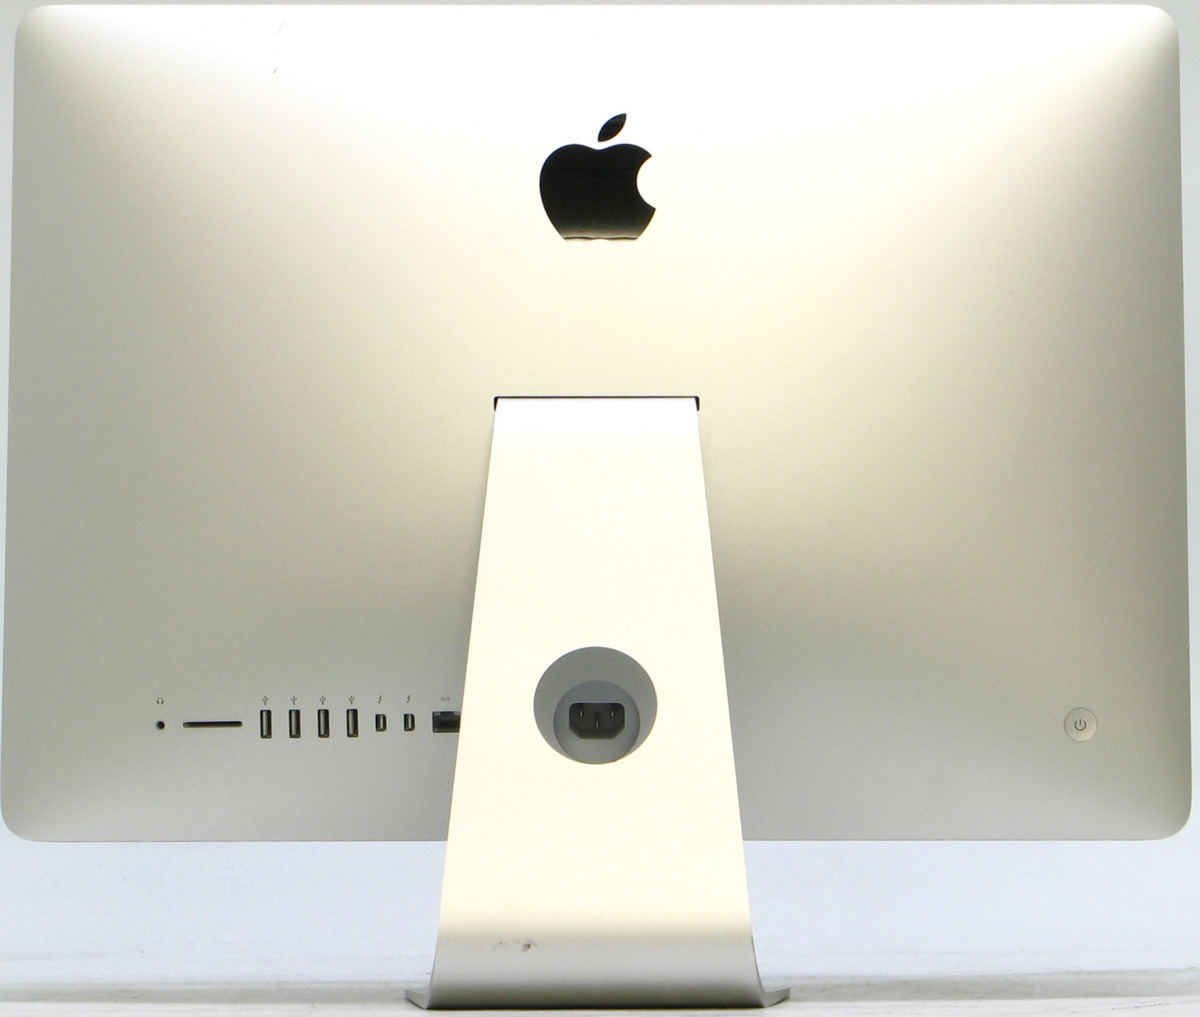 C-2127/Apple iMac MK142J/A 21.5-inch Late 2015  一体型 Corei5 メモリ 8GB HDD 1TB OS11.4 中古 Macintosh 液晶一体型 #50